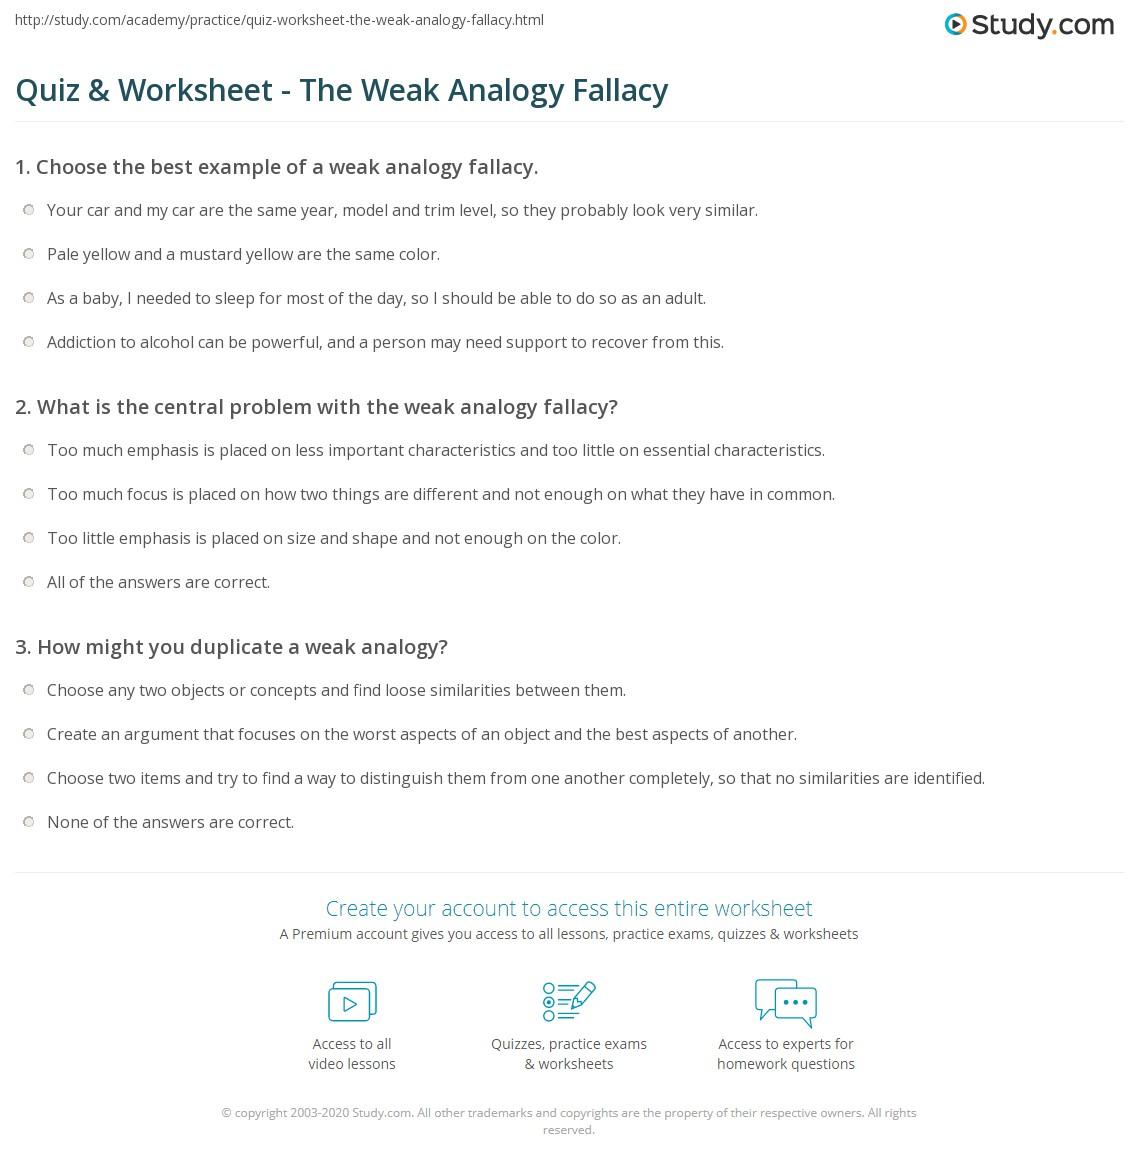 Examples Of Weakogy Fallacies